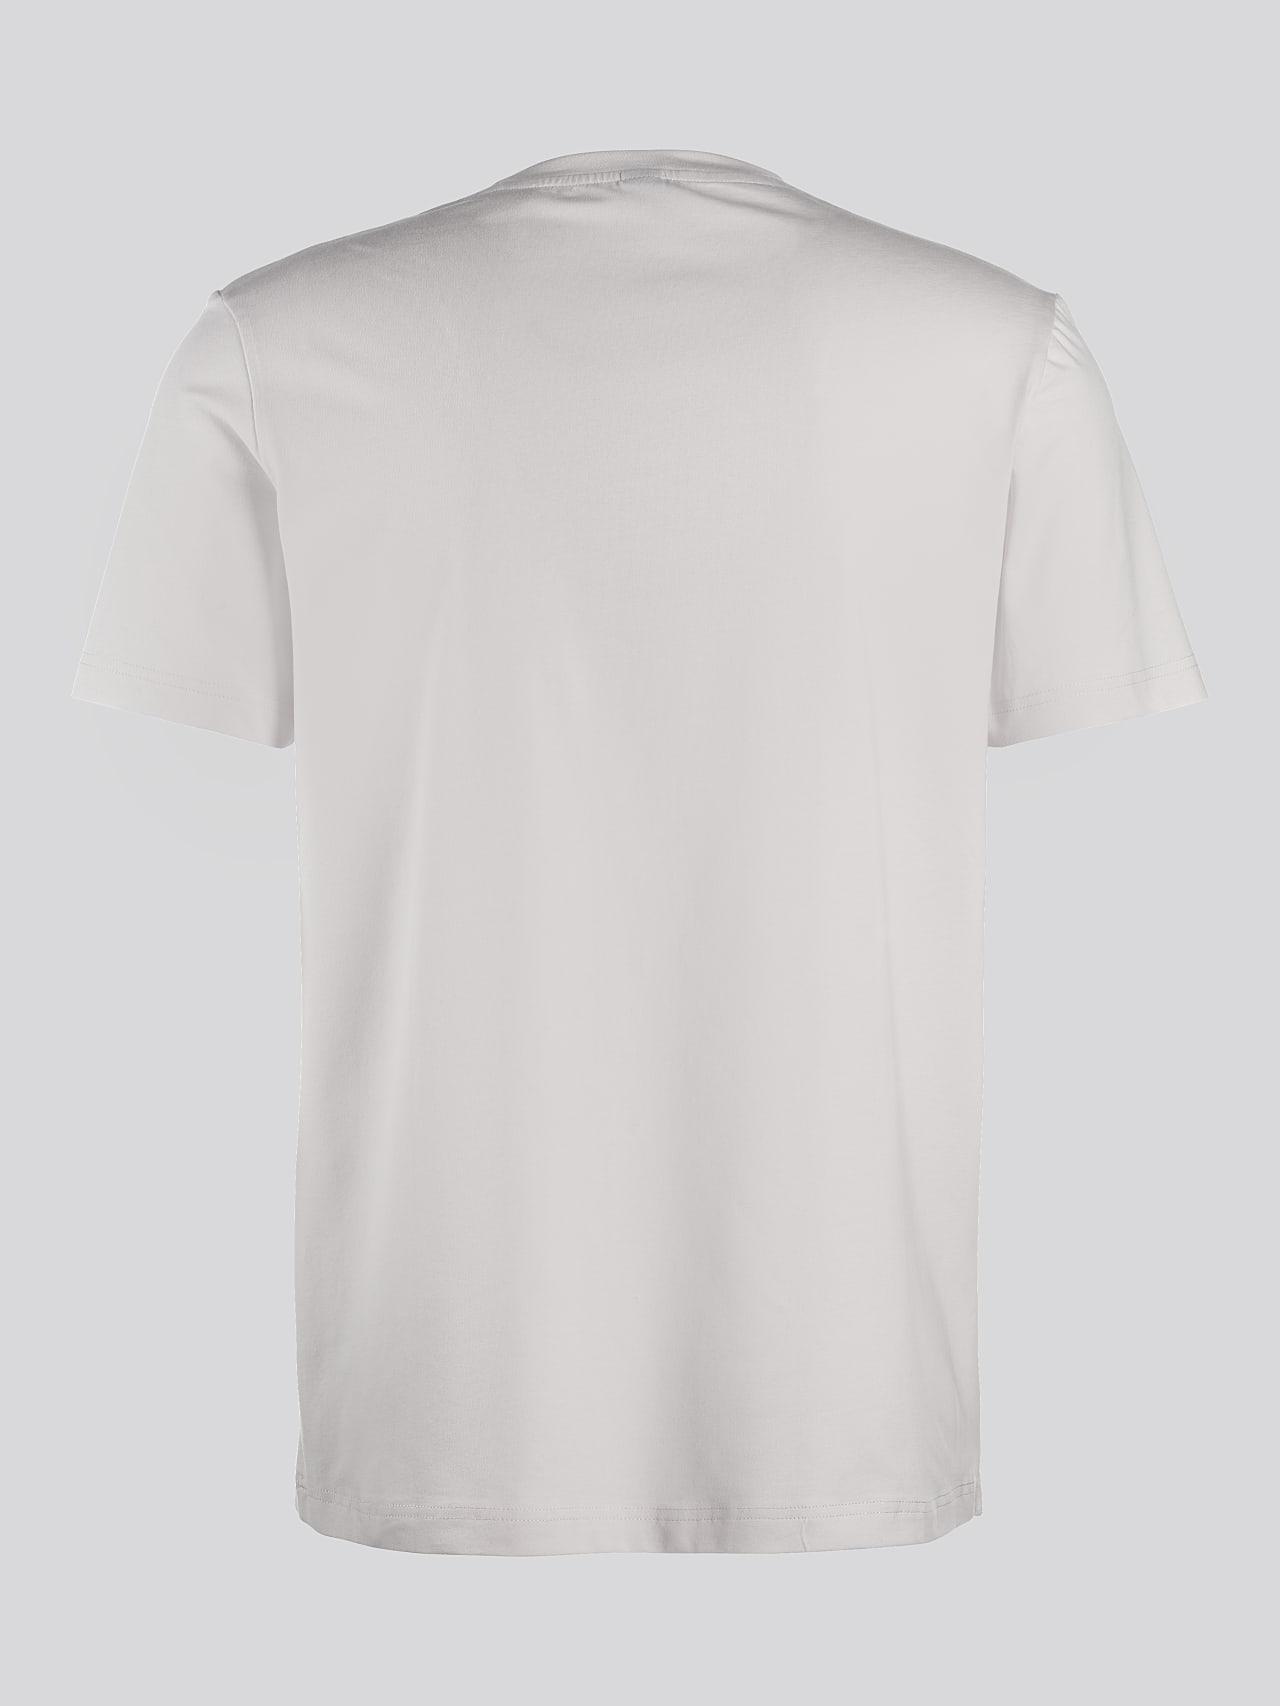 JERO V2.Y4.02 Signature Logo T-Shirt Sand Left Alpha Tauri